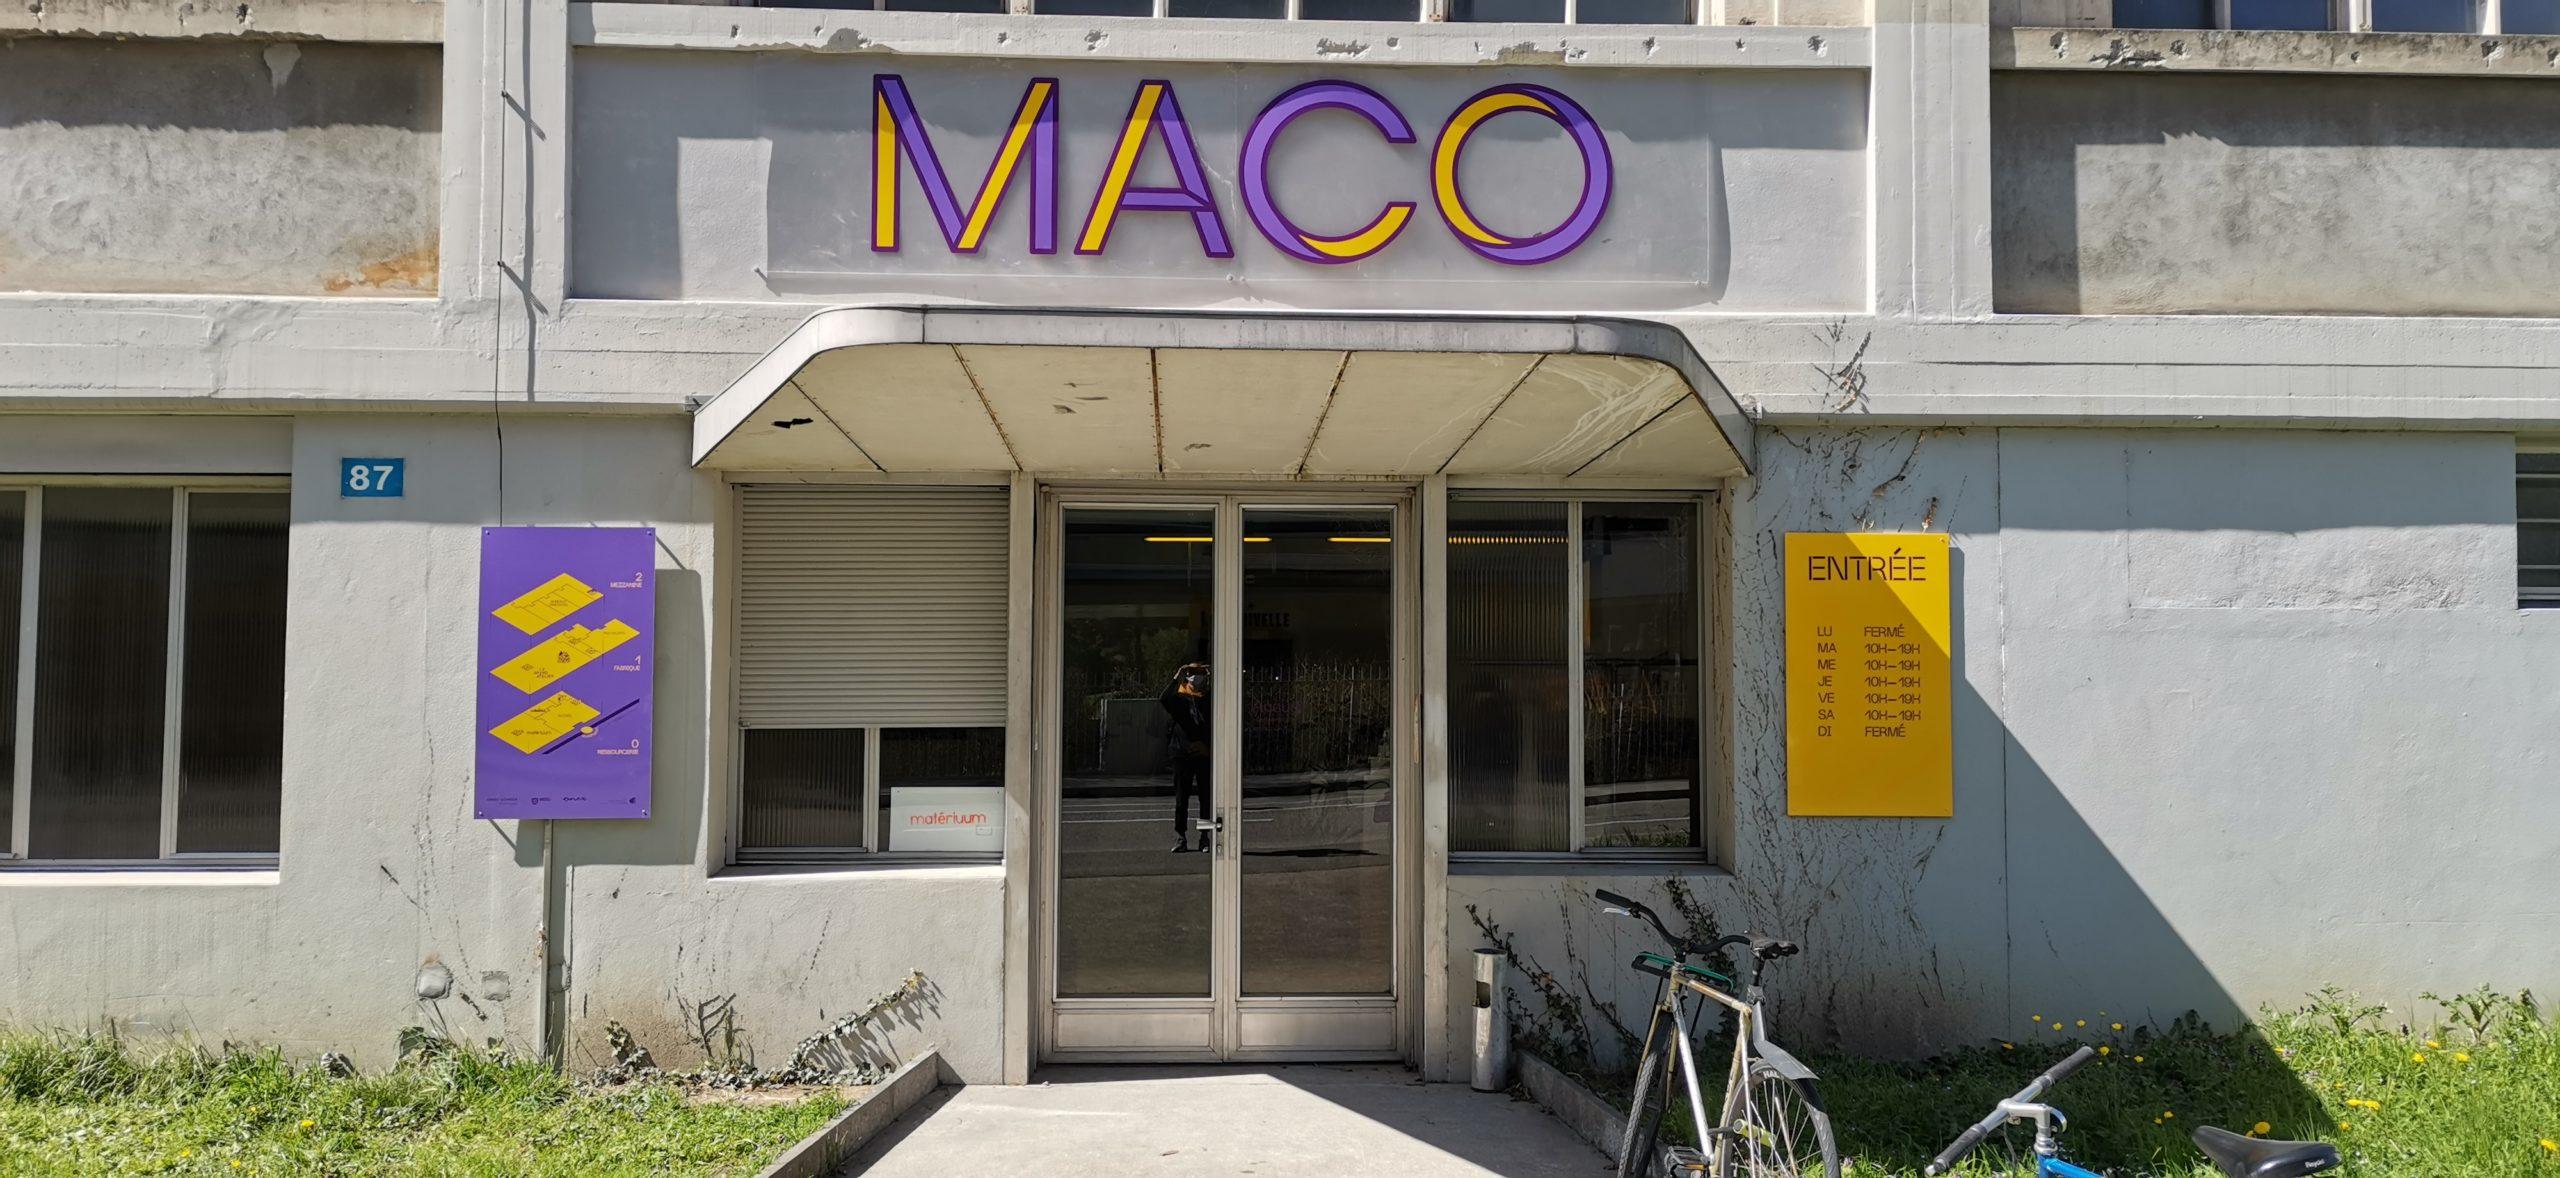 MACO_01